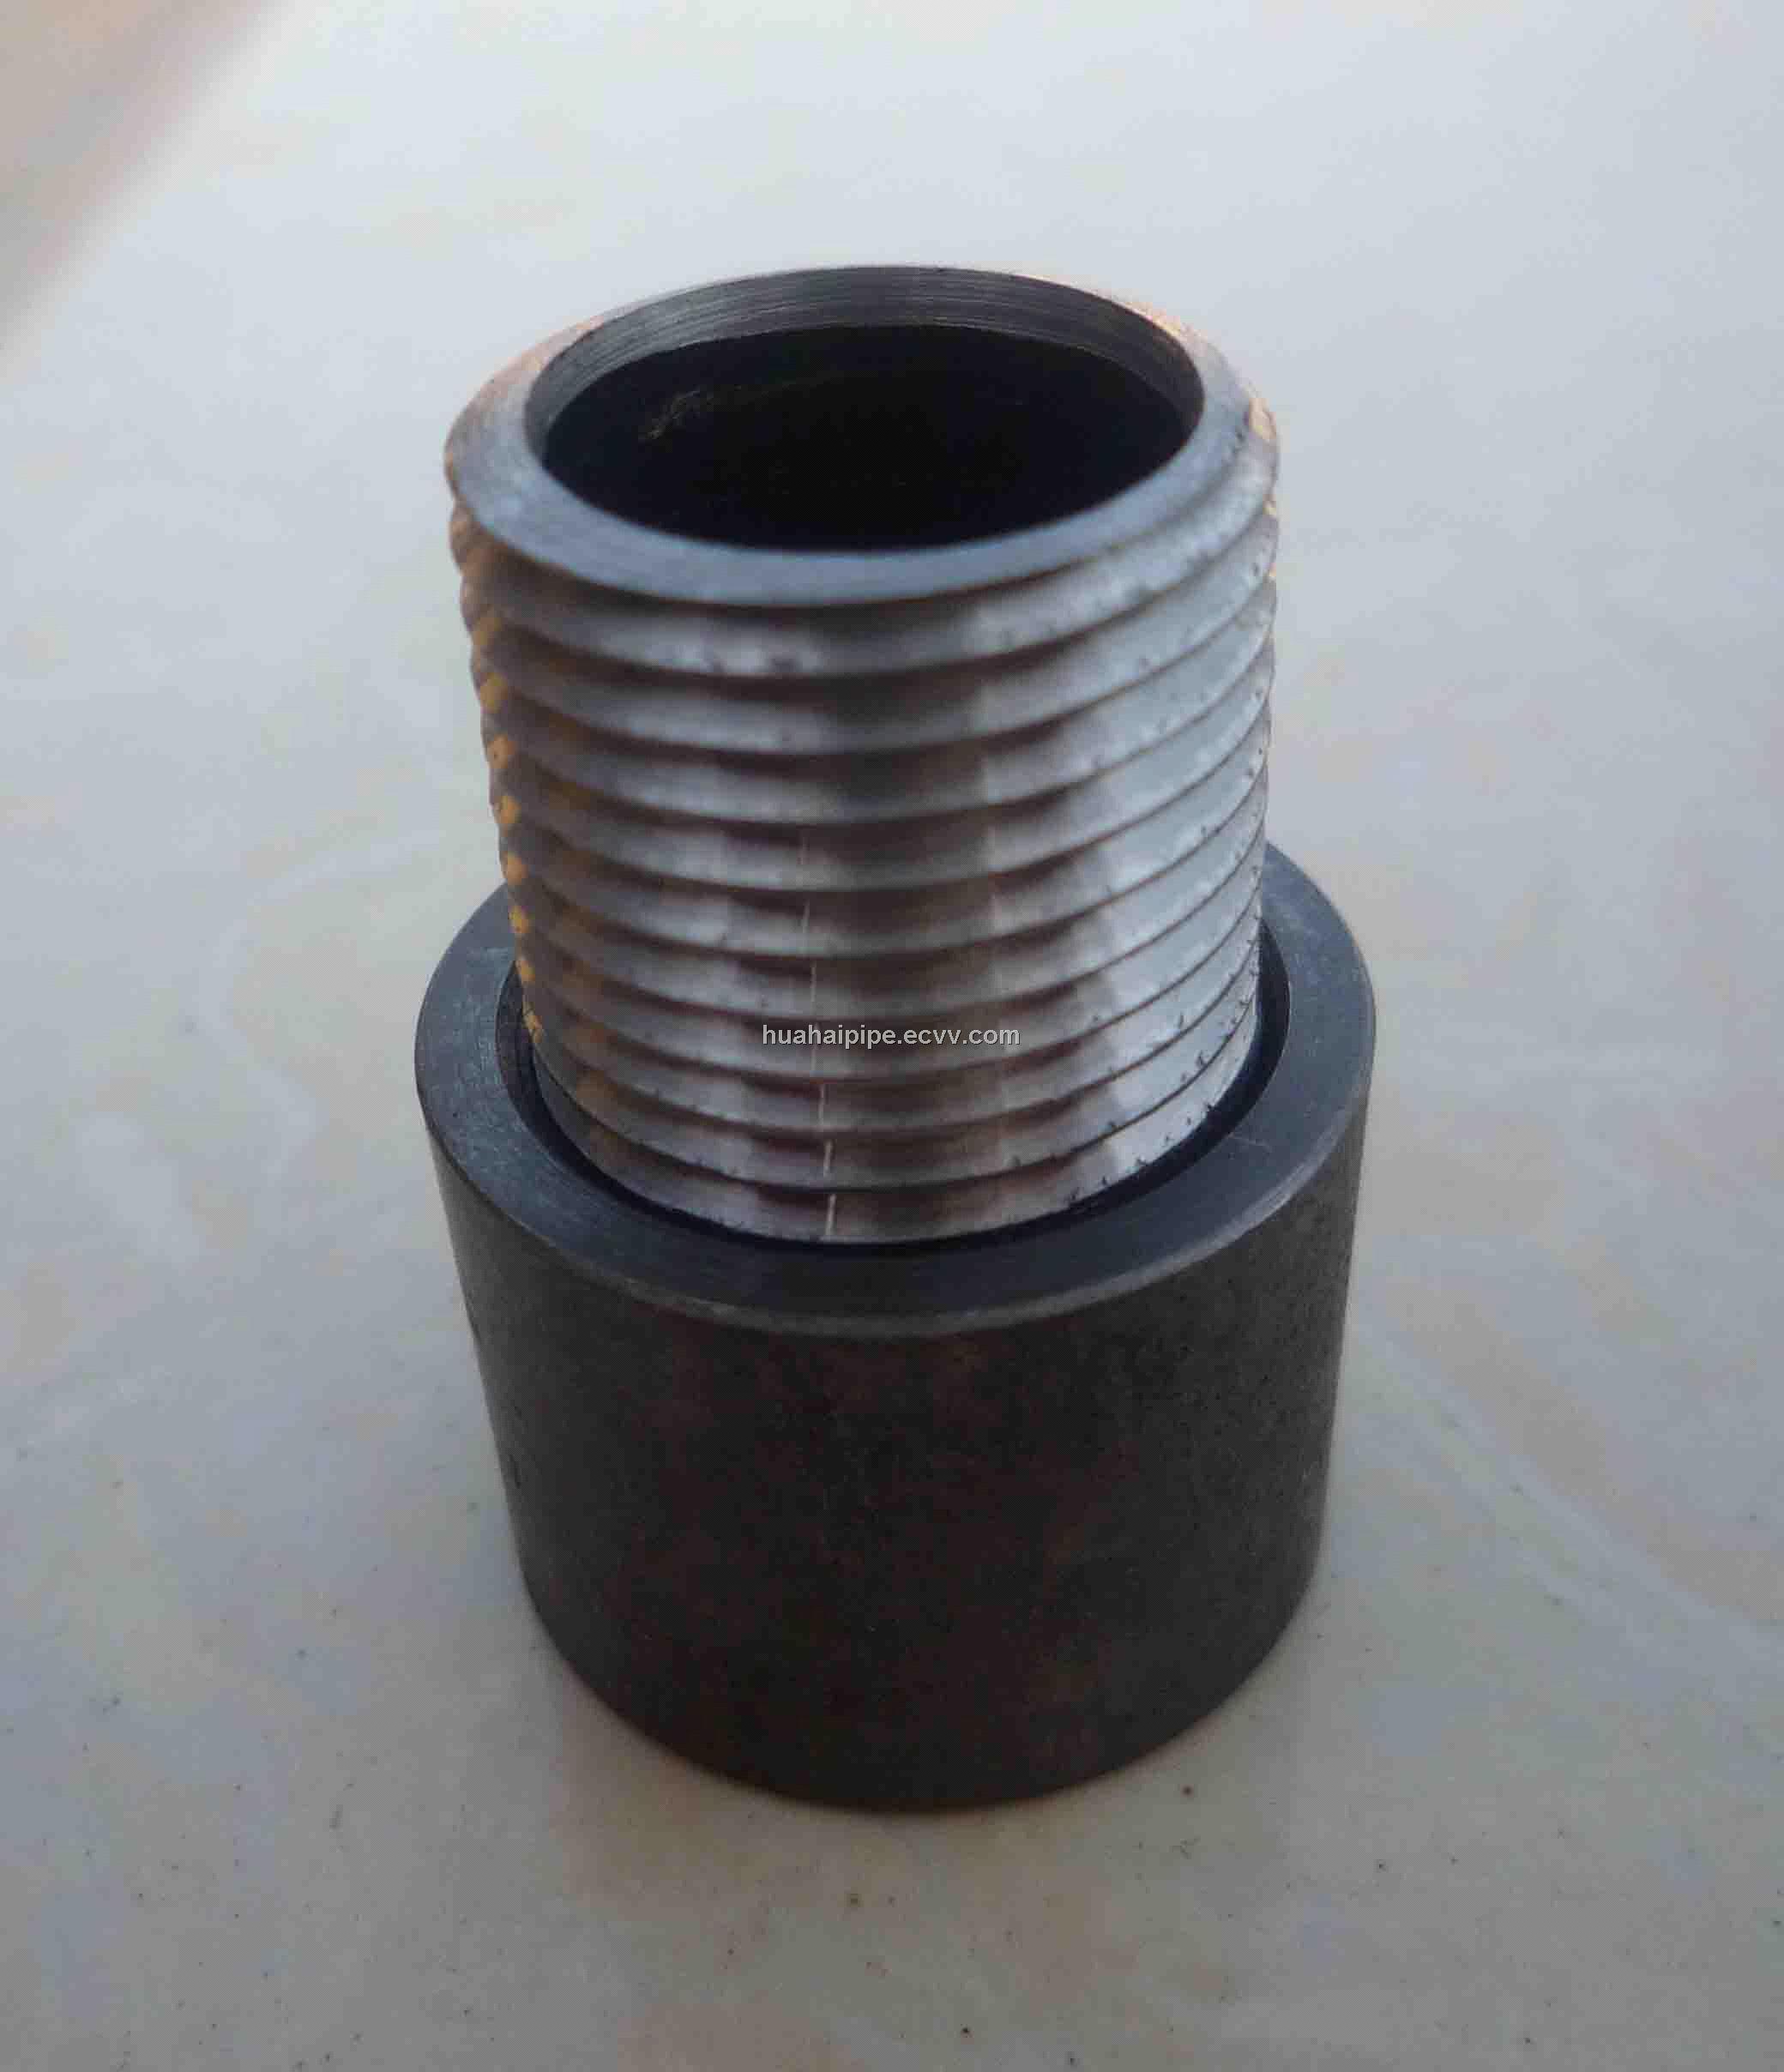 Asme carbon steel close nipple npt thread purchasing